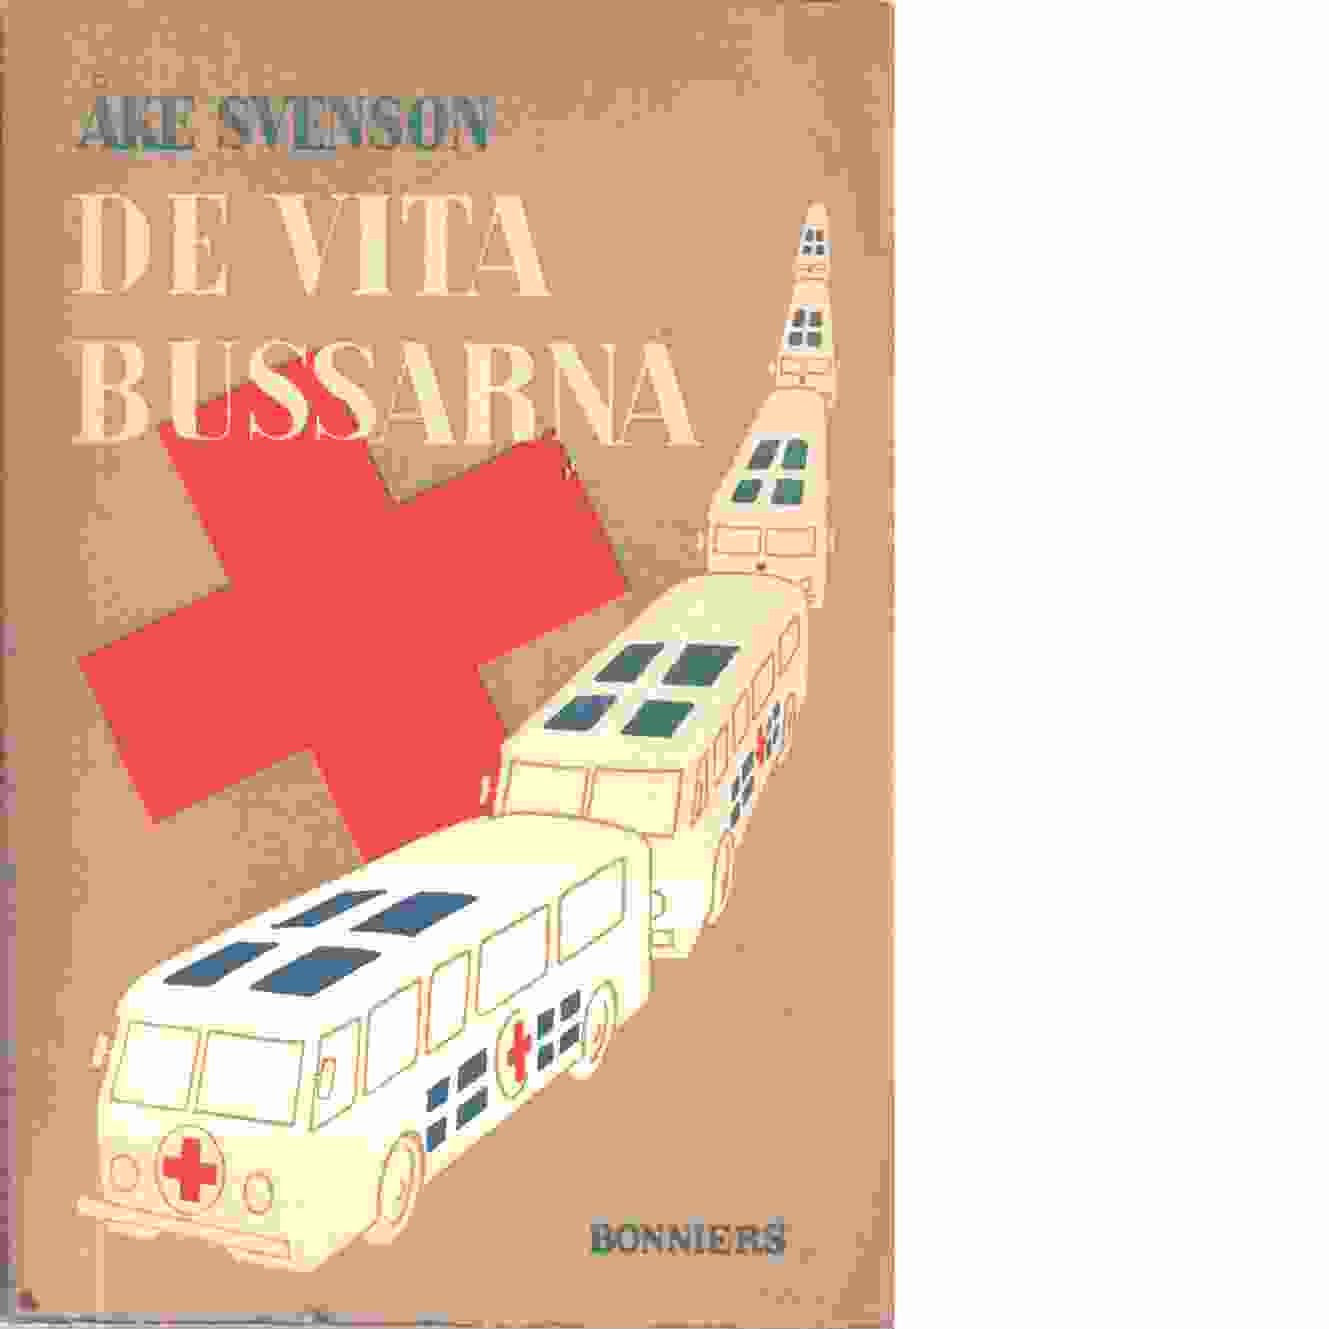 De vita bussarna - Svenson, Åke